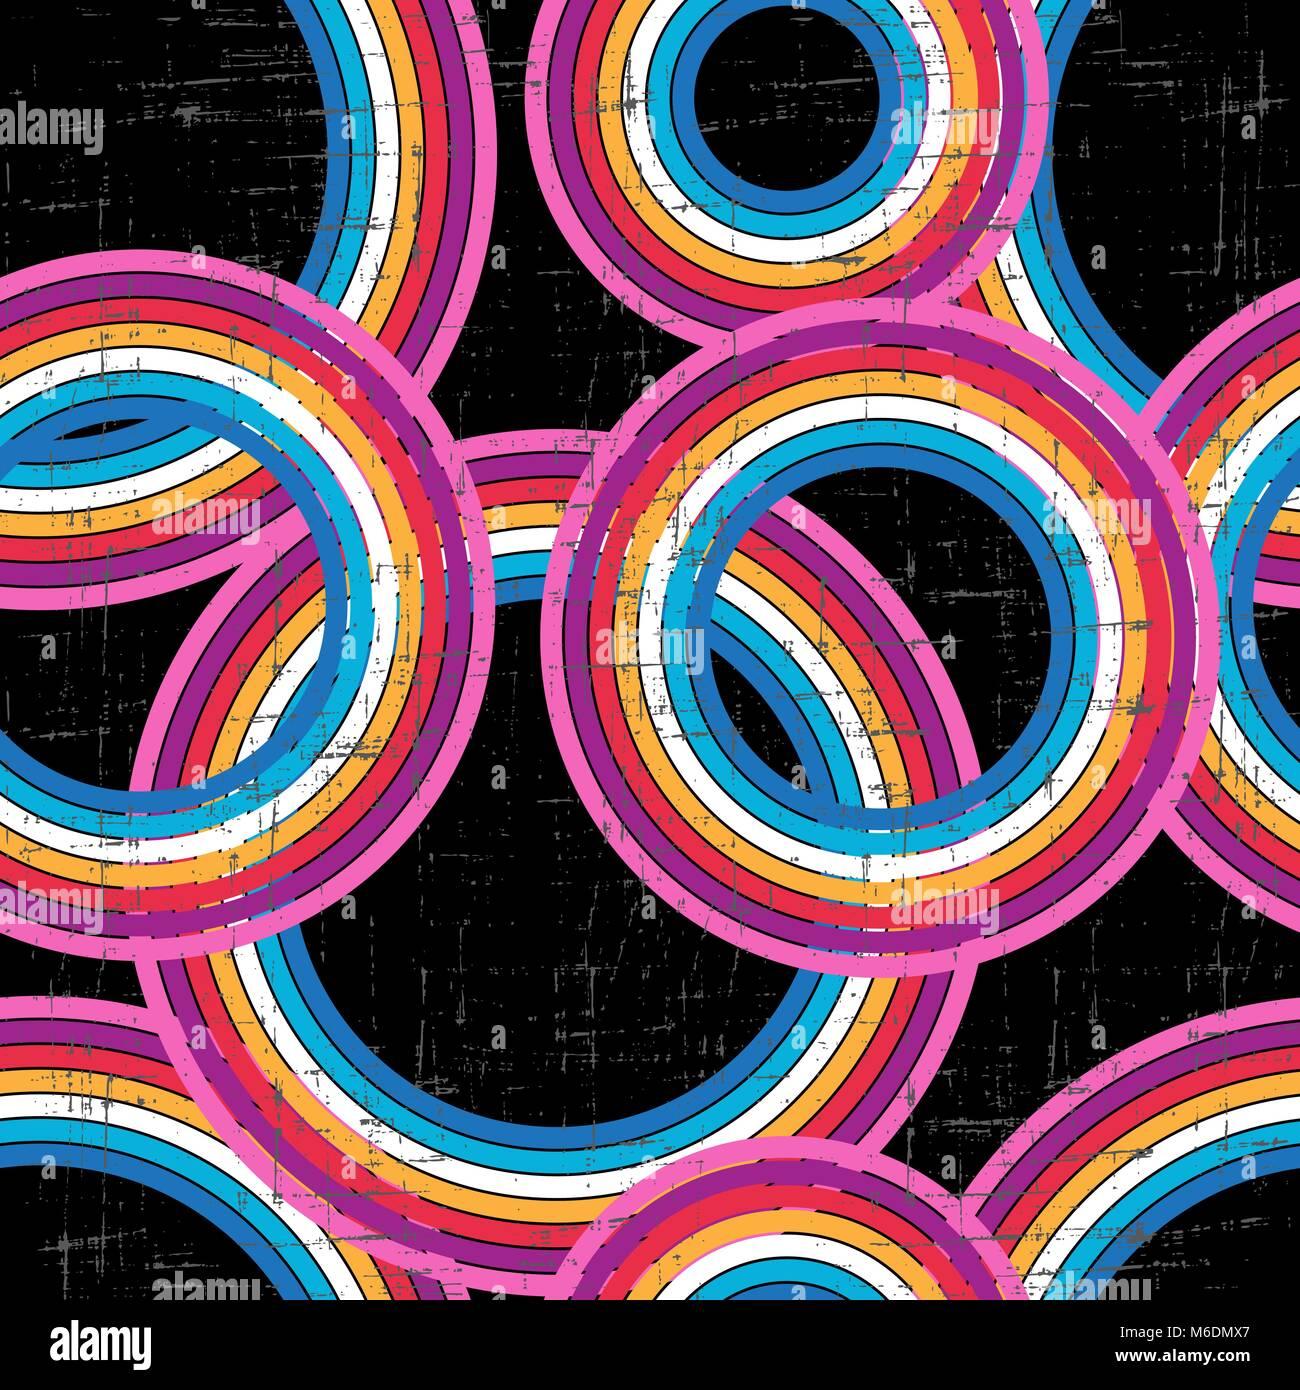 Retro grunge fond coloré - vector pattern transparente Photo Stock